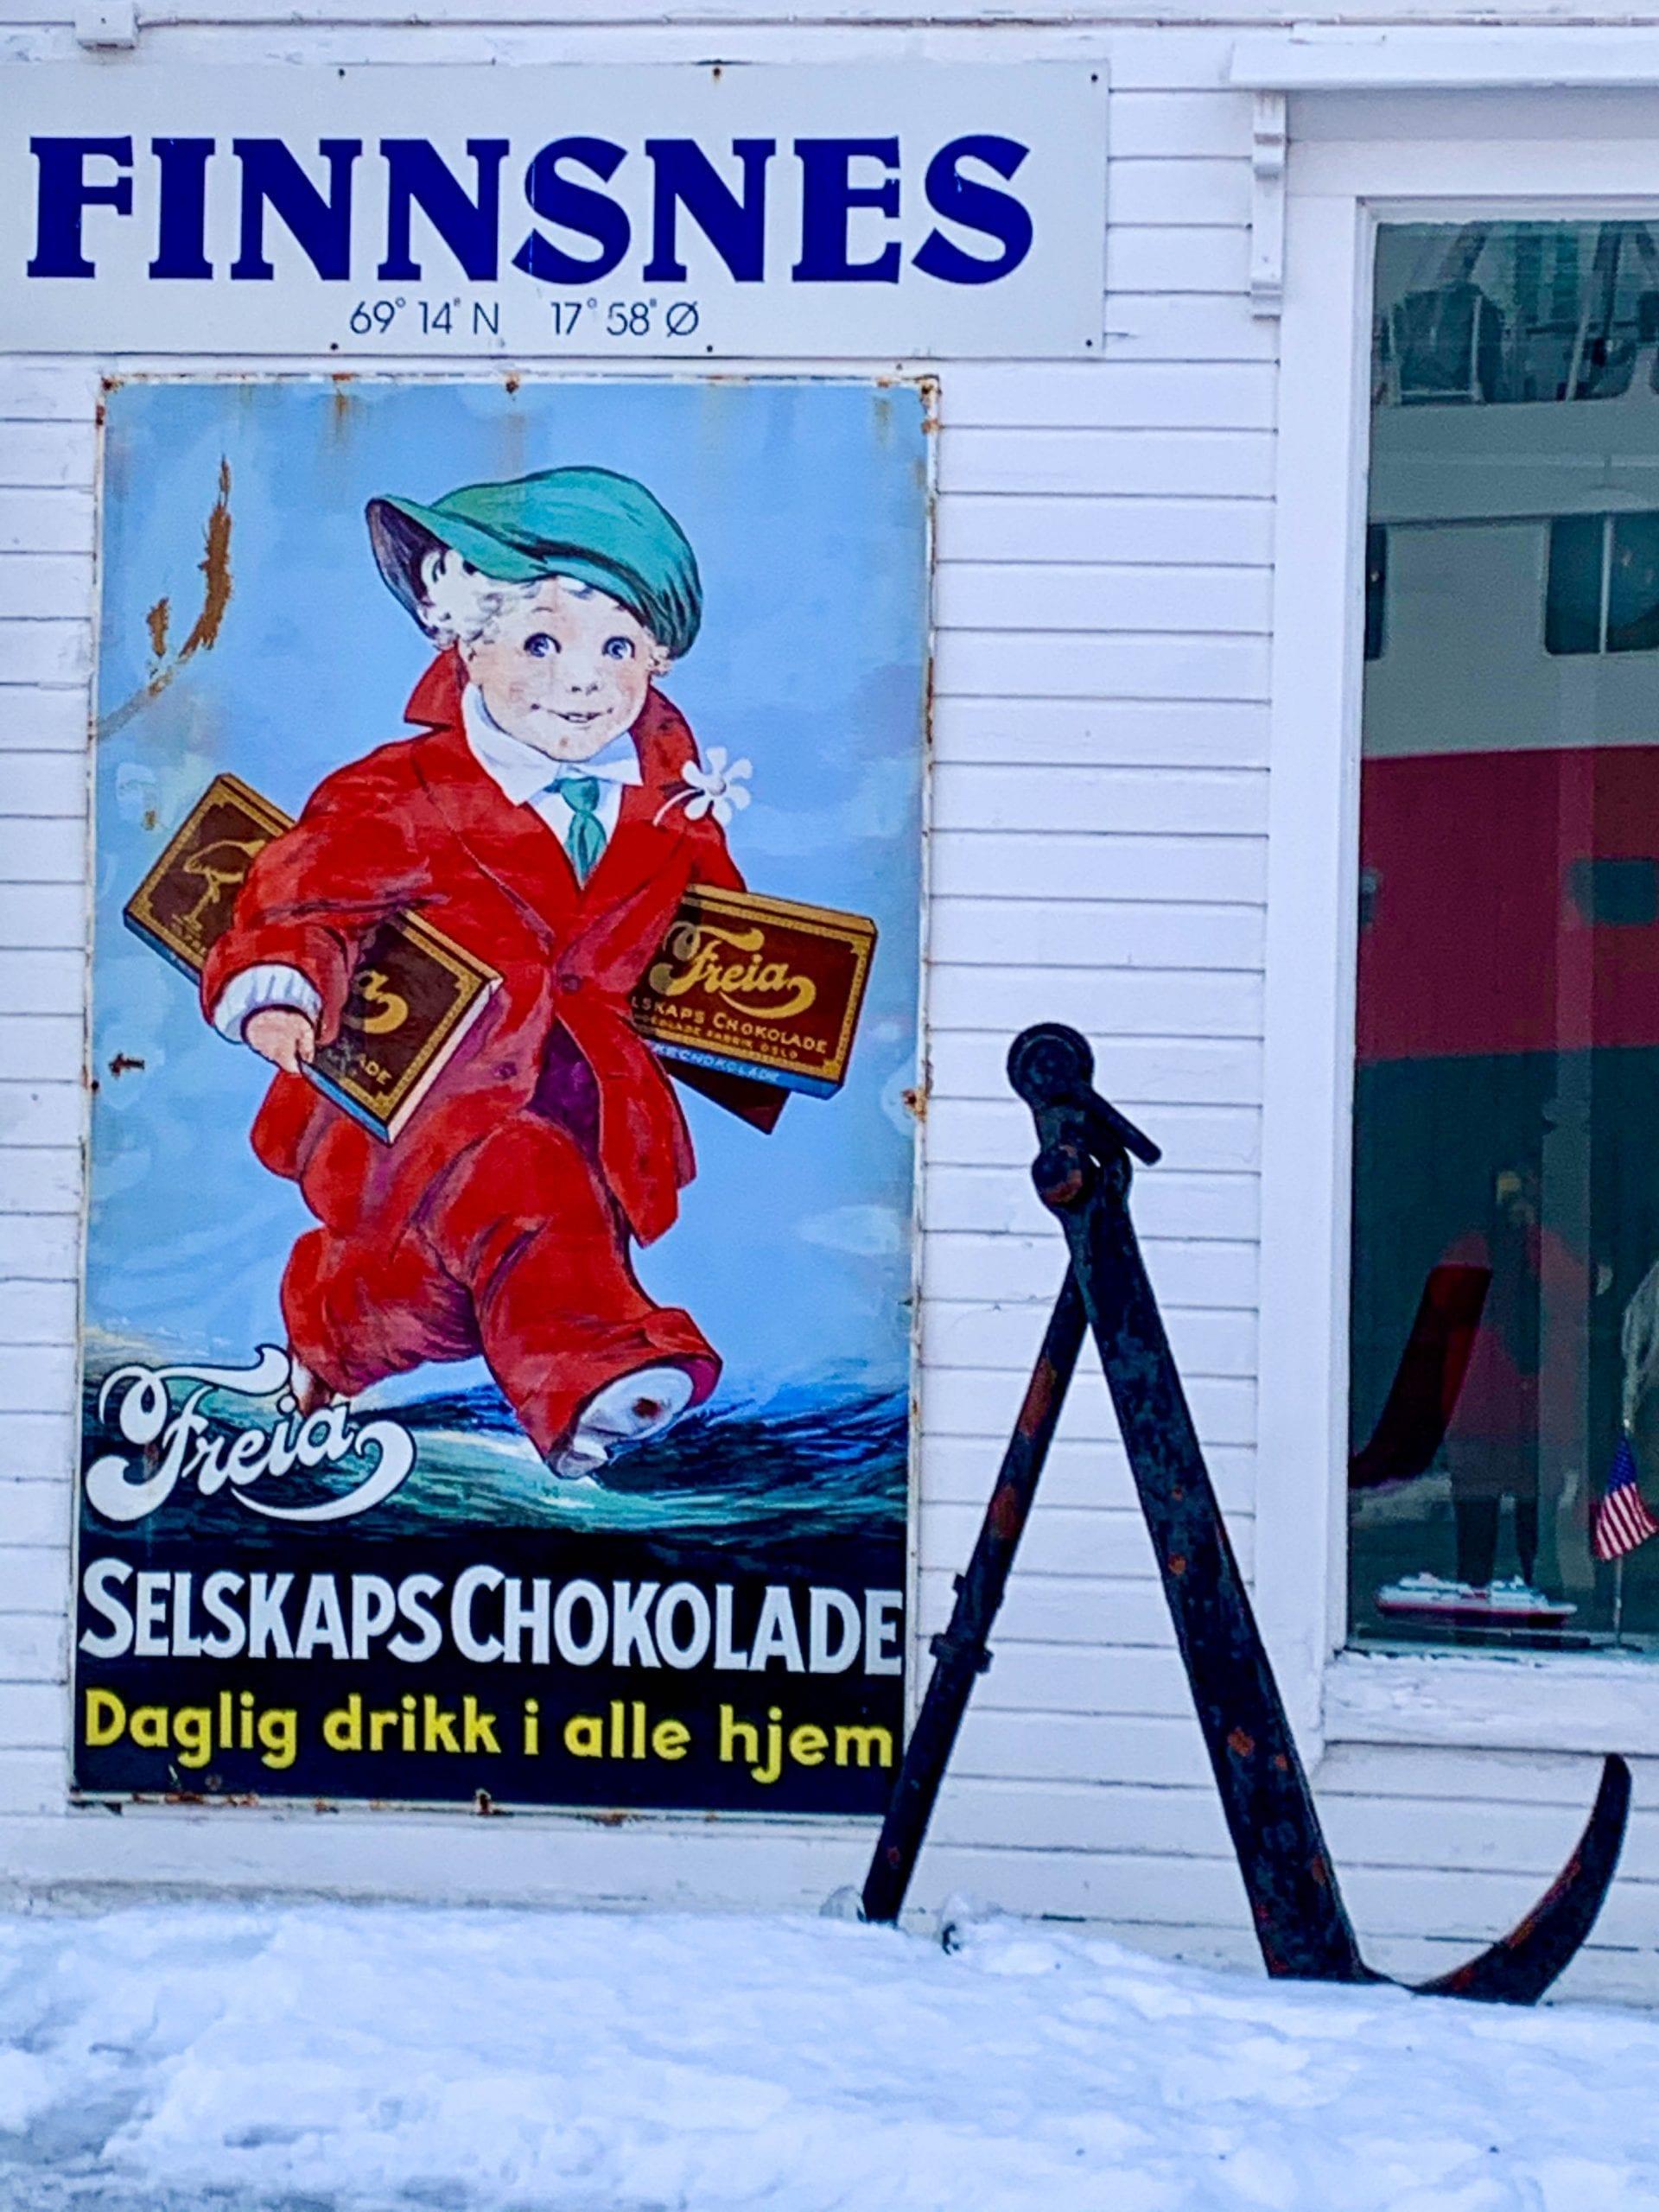 Wandering Norway